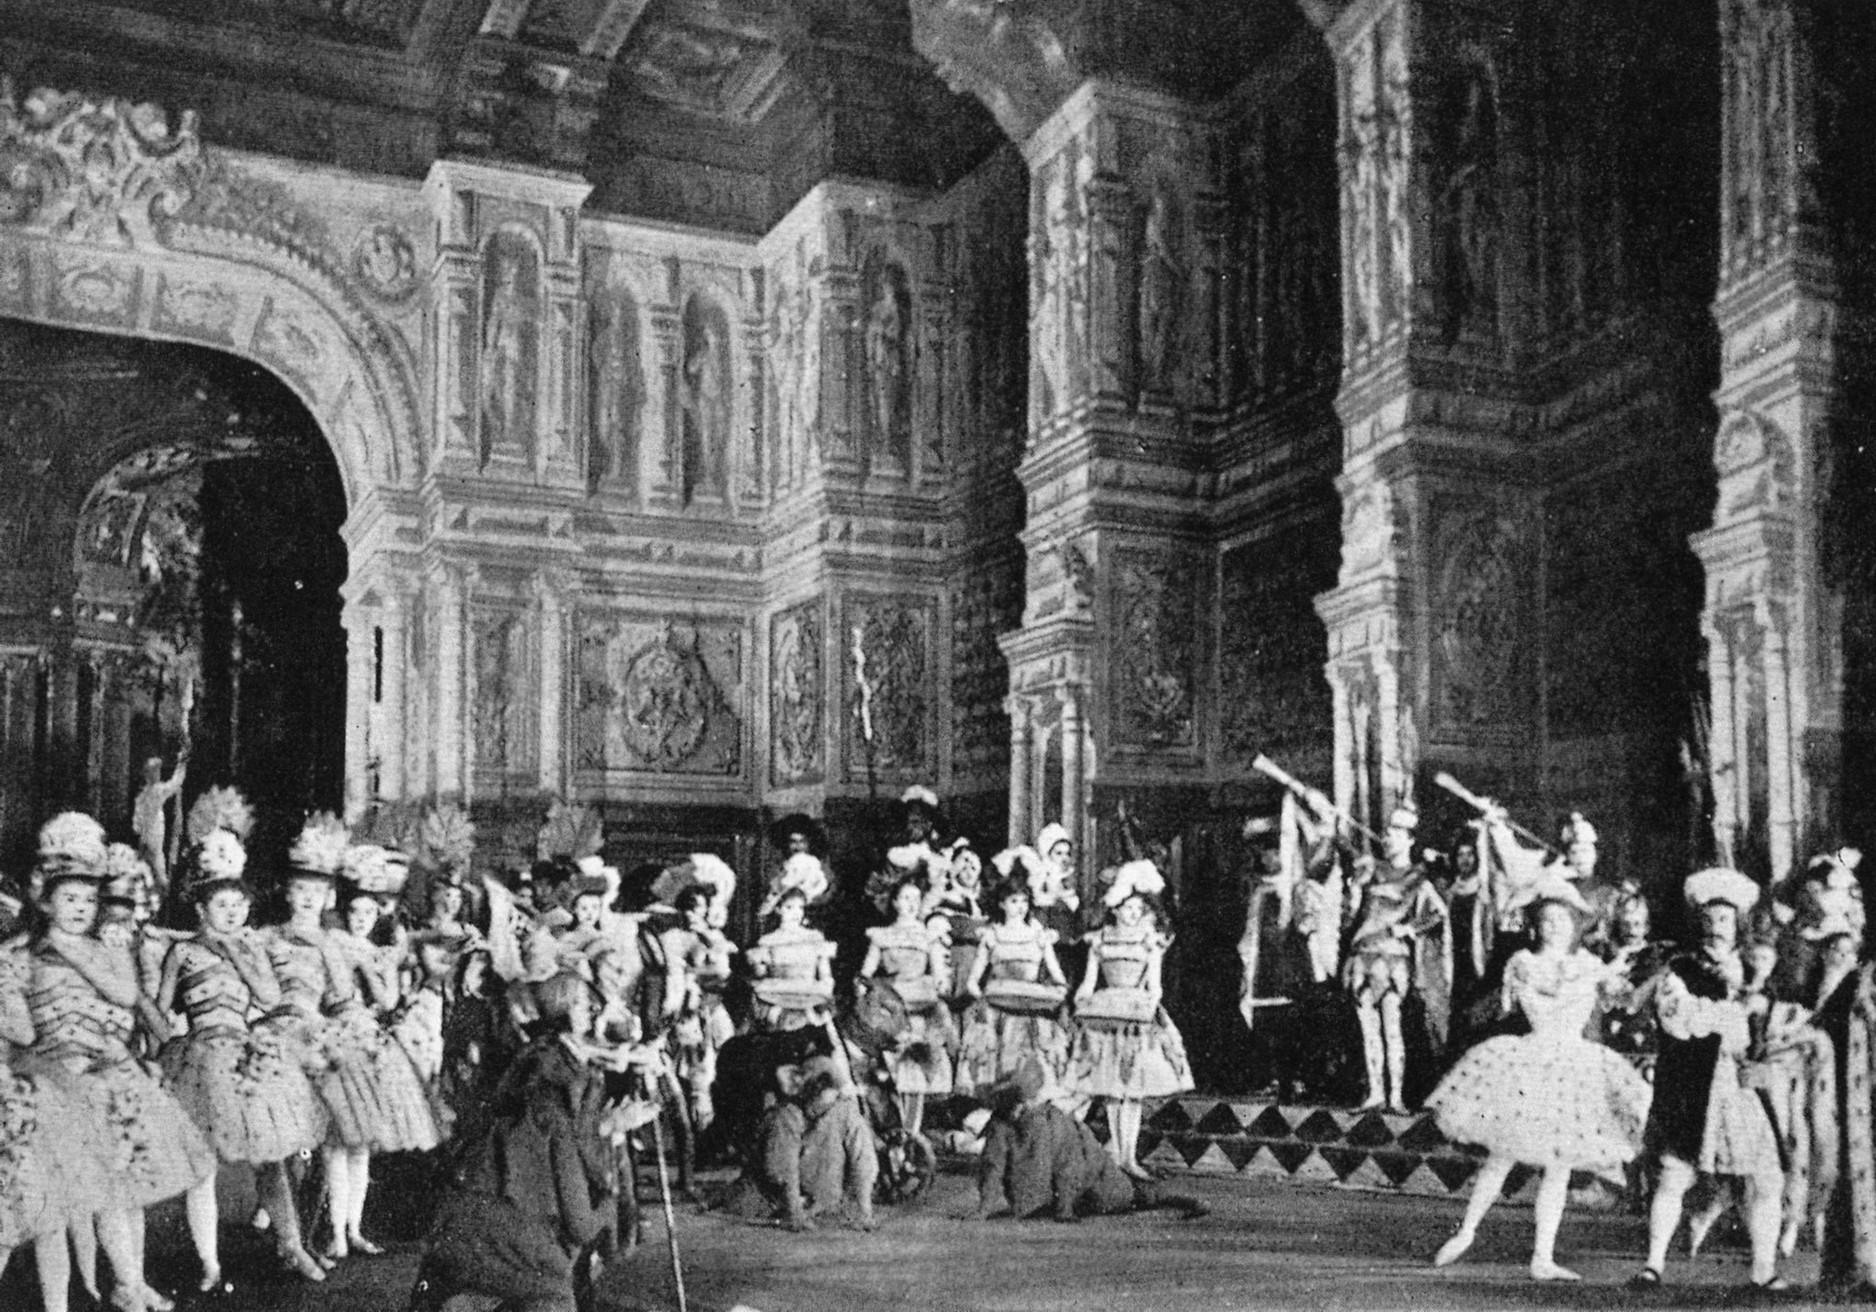 File:Sleeping Beauty -Prologue -1890.JPG